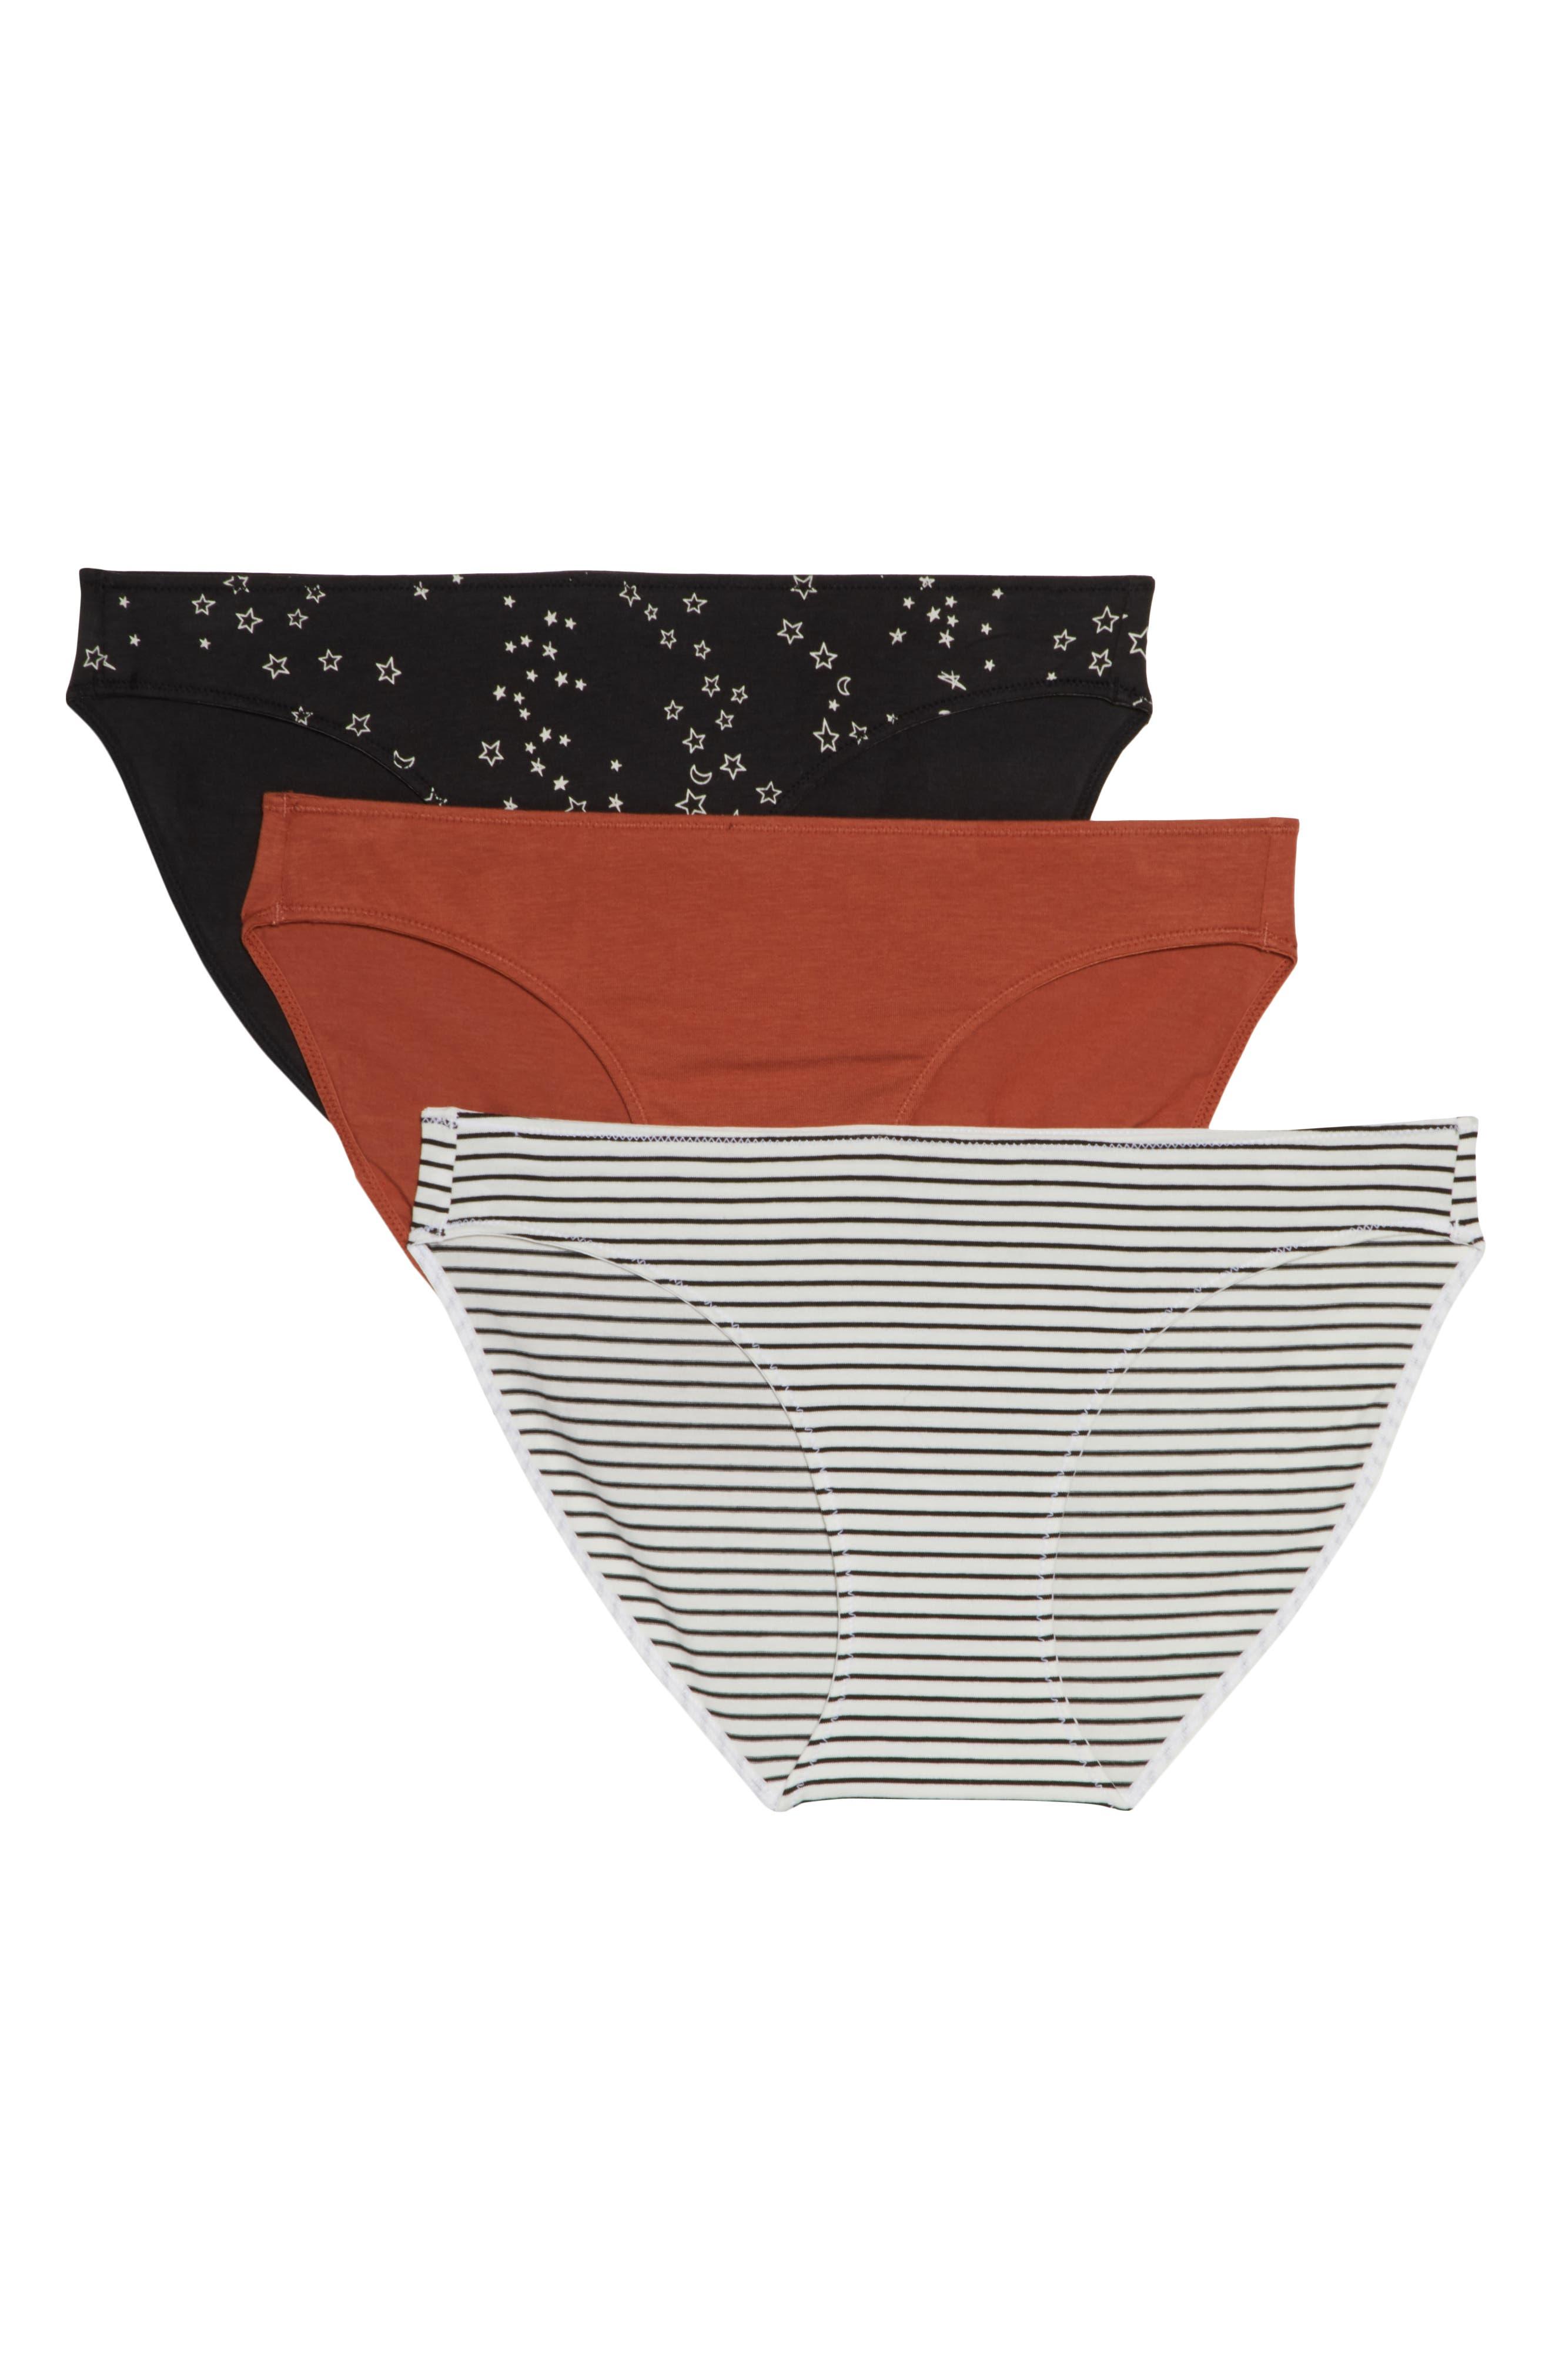 3-Pack Bikini,                         Main,                         color, TWISTED RED STRIPE